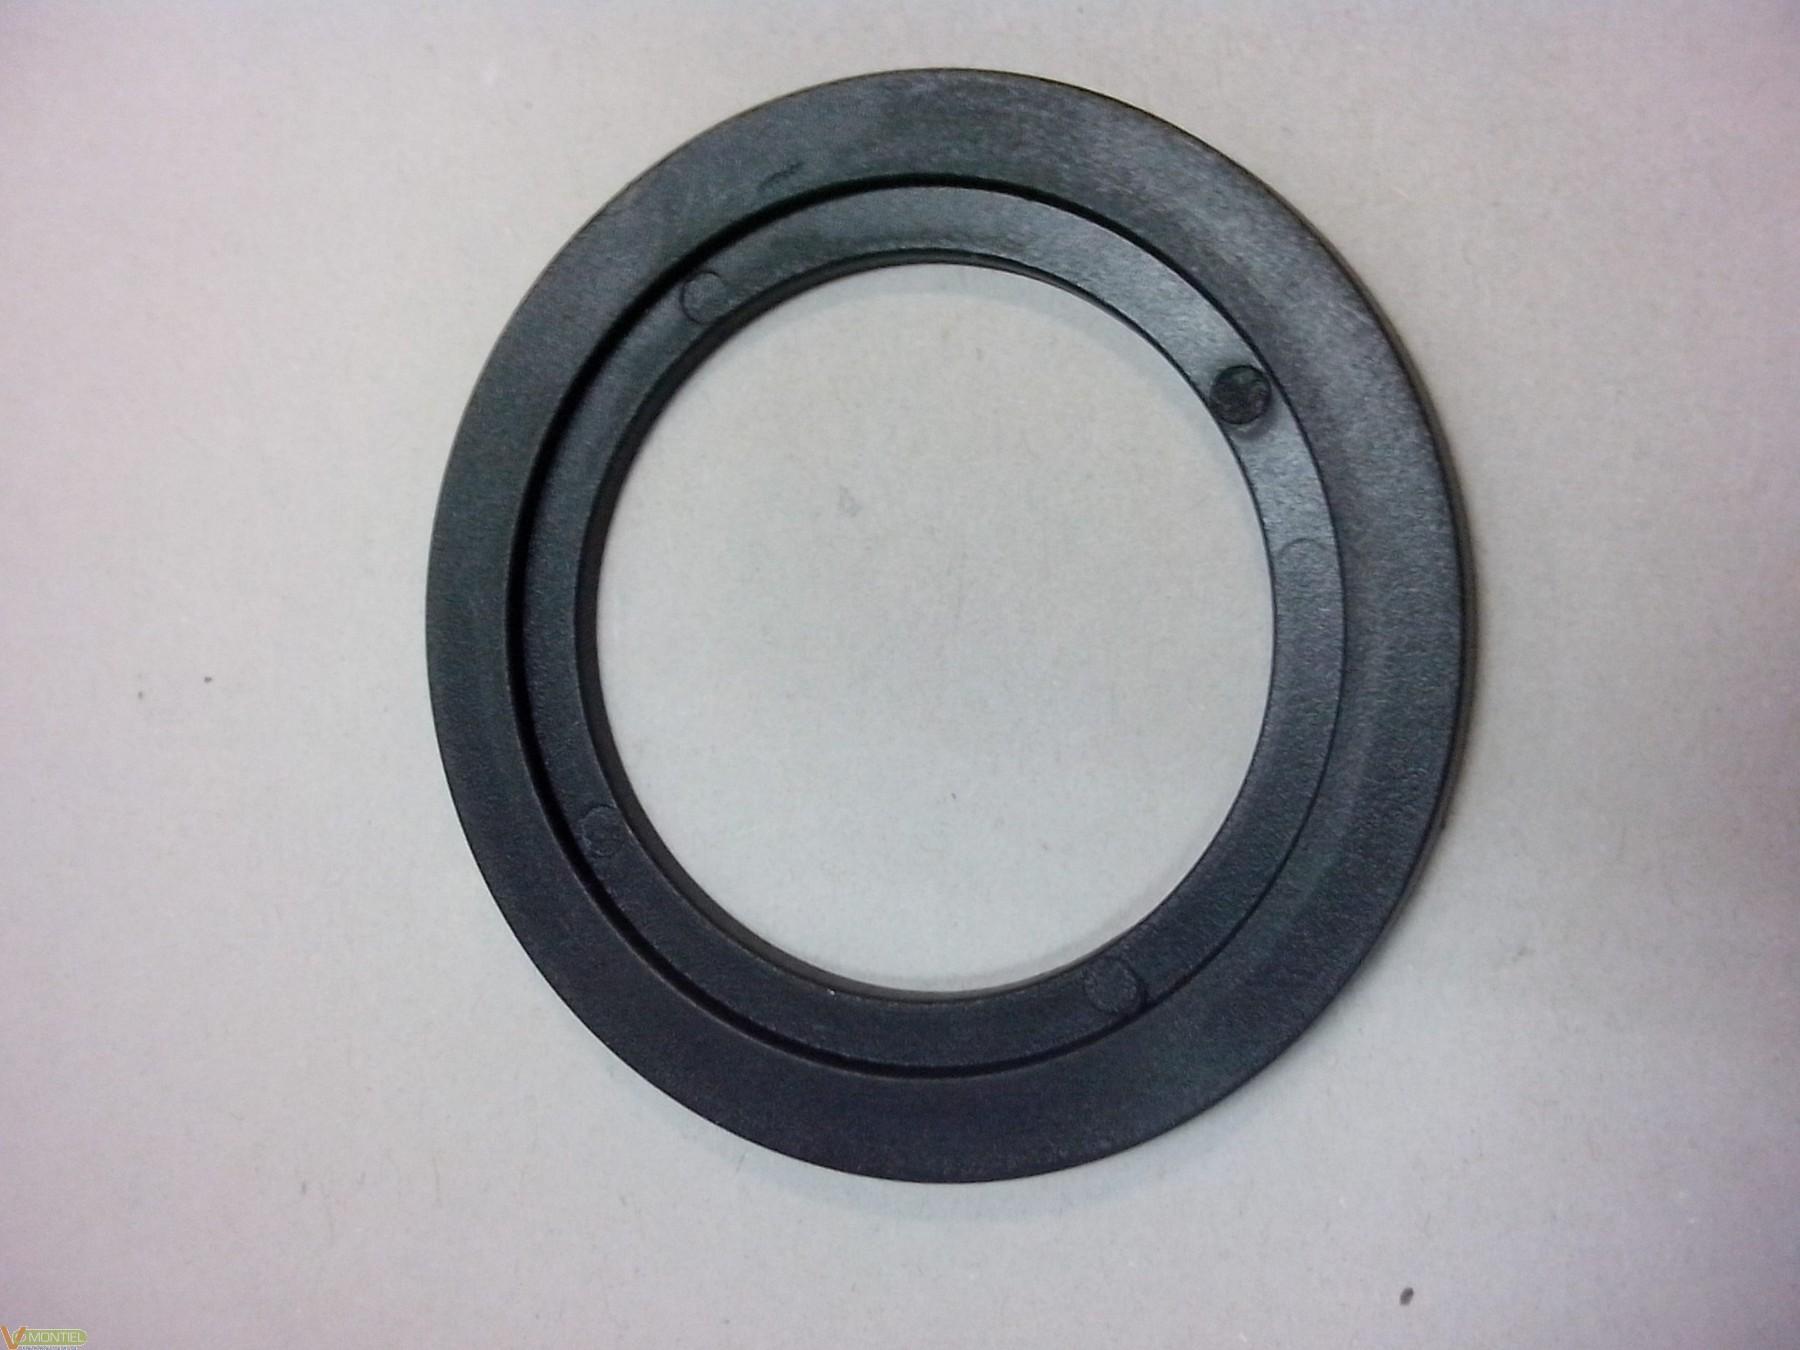 Escudo bocallave n-60-ne nyl n-0